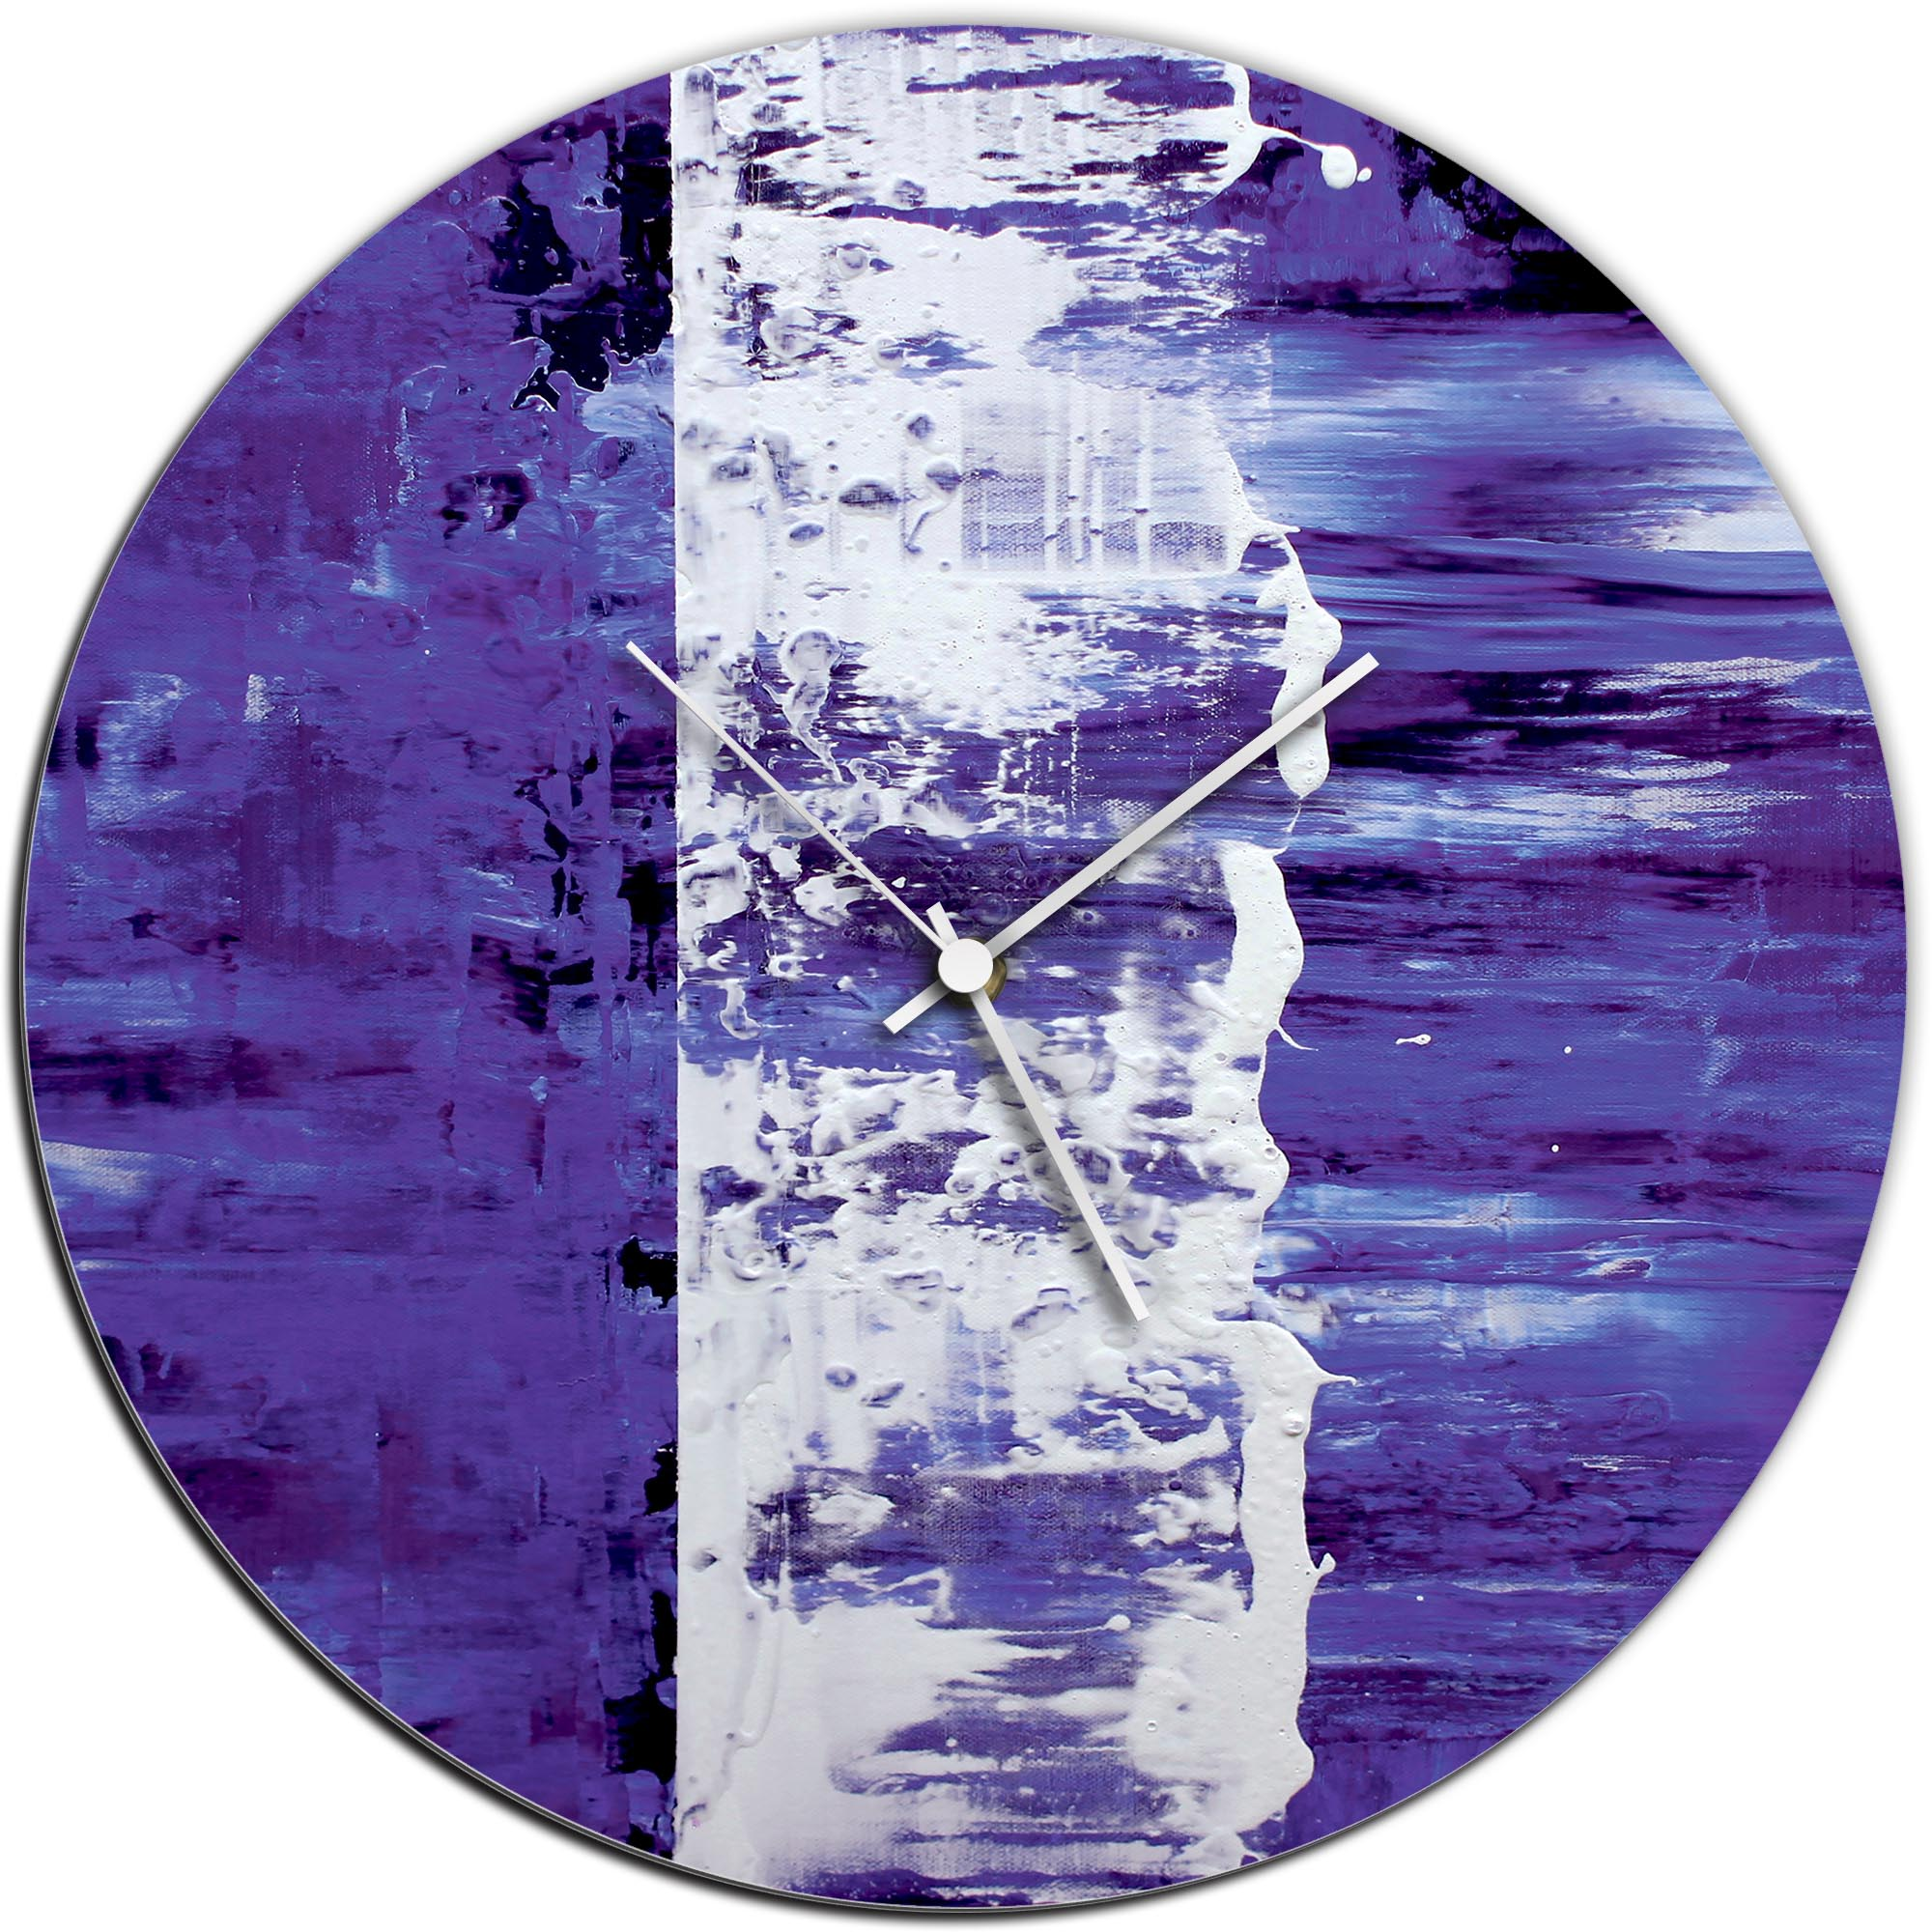 Mendo Vasilevski 'Purple Street Circle Clock Large' 22in x 22in Modern Wall Clock on Aluminum Composite